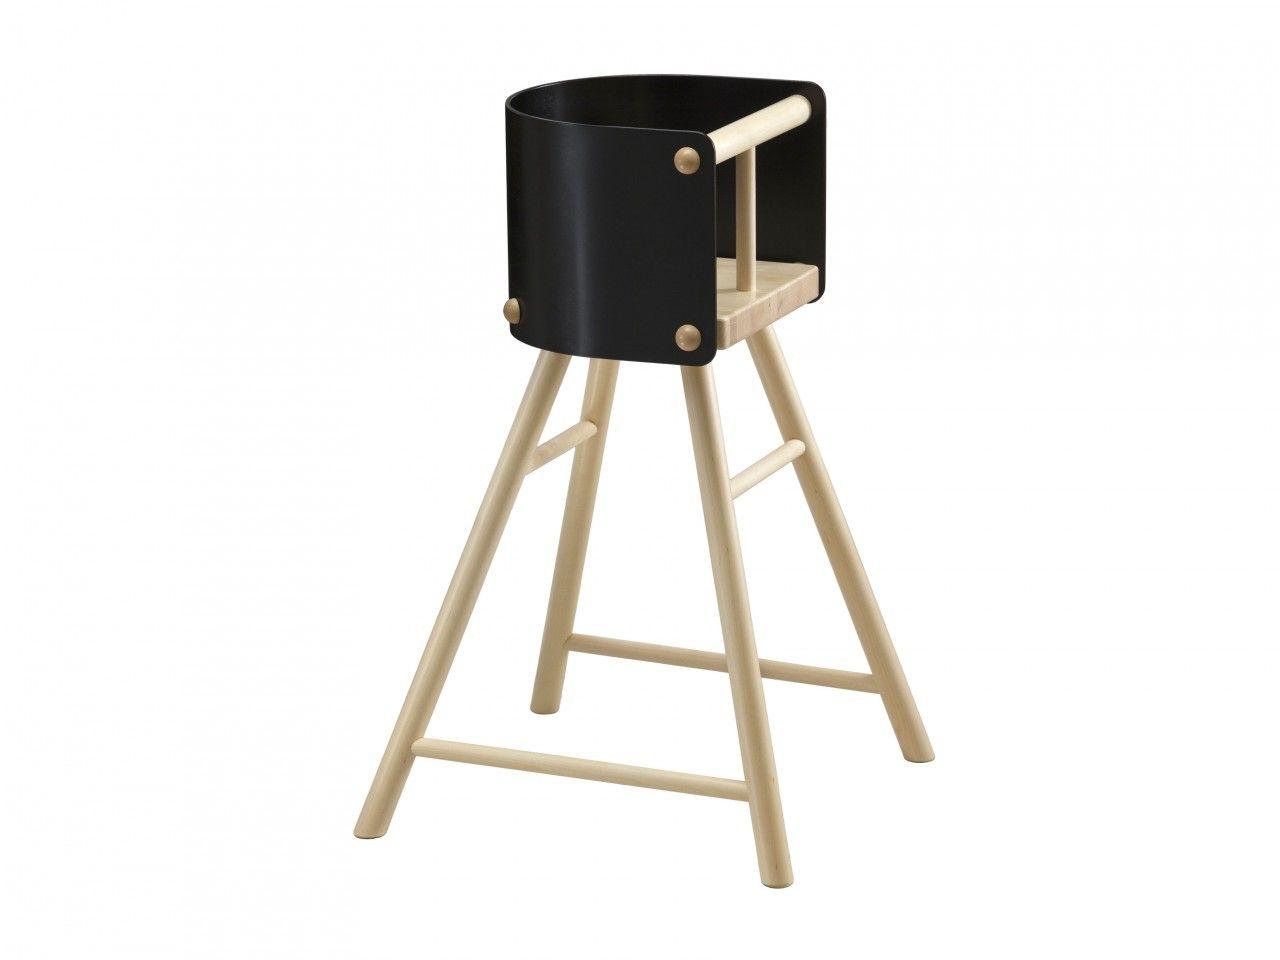 662878 dining chair slipcovers ikea - Leuke Kinderstoel Van Artek Al Groeit Ie Niet Echt Mee Baby Chair 616